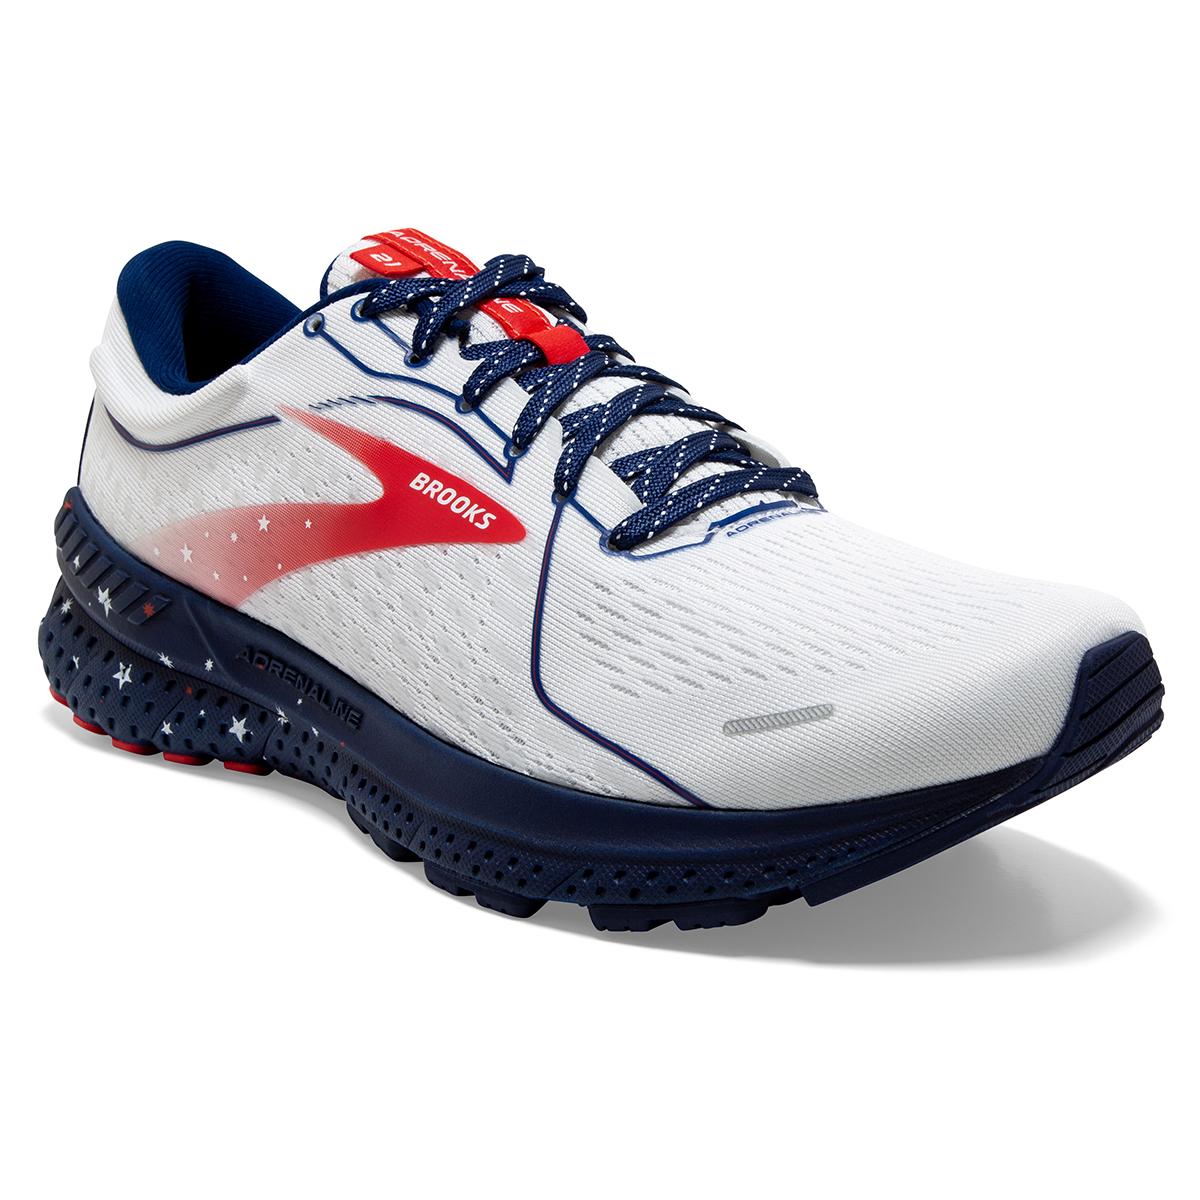 Men's Brooks Adrenaline GTS 21 Running Shoe - Color: White/Blue/Red - Size: 7 - Width: Regular, White/Blue/Red, large, image 2